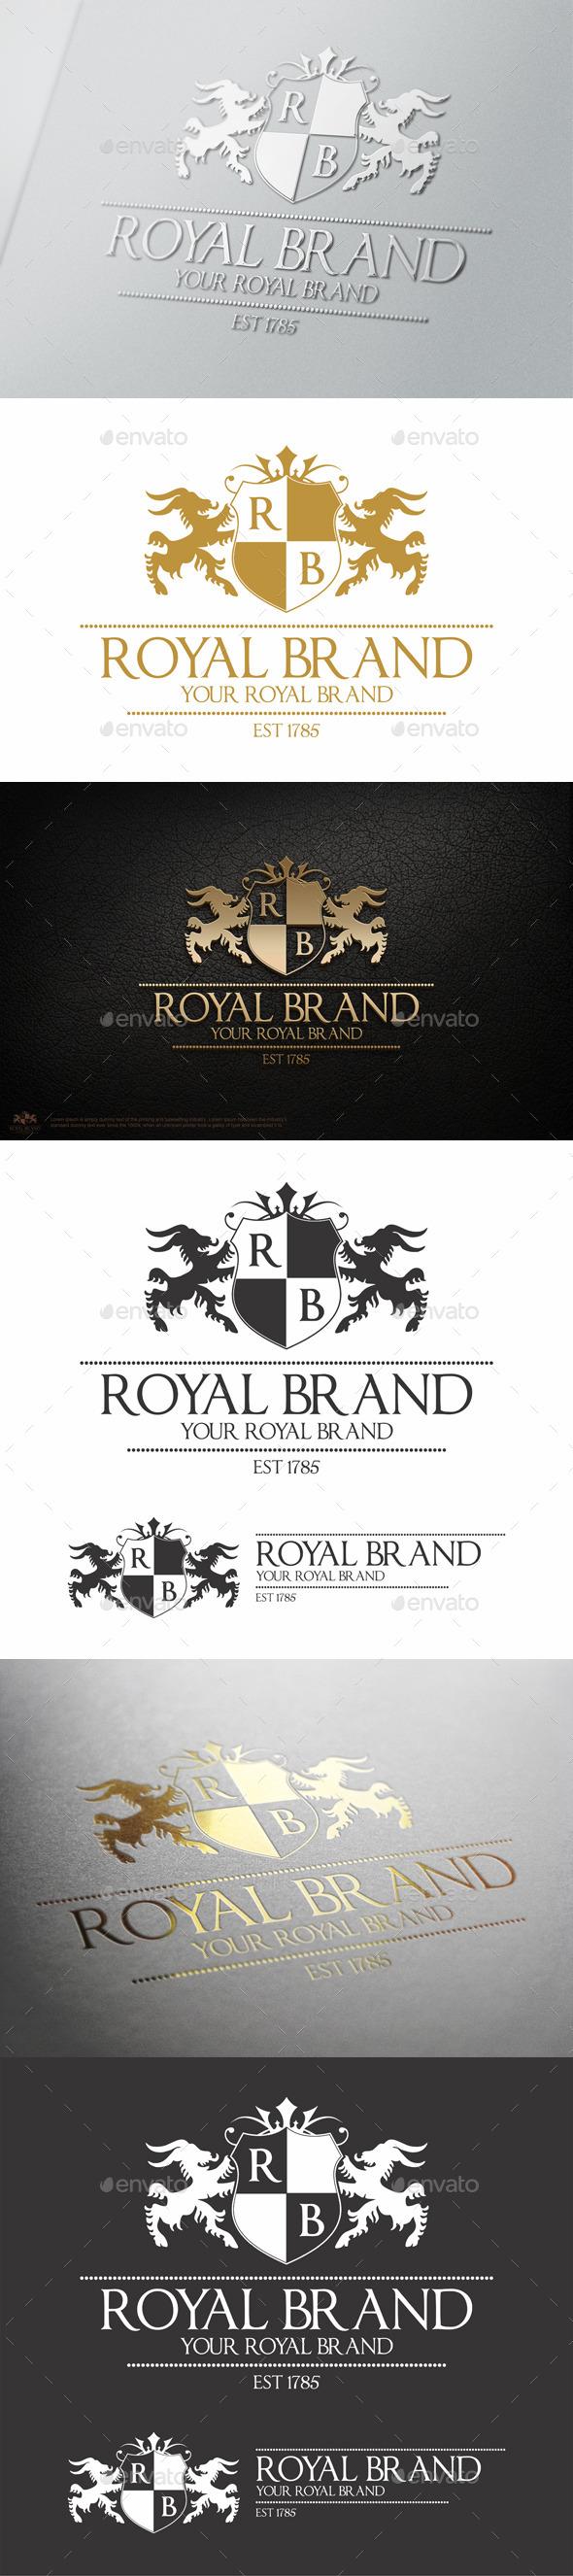 Heraldic Royal Brand Crest Logo